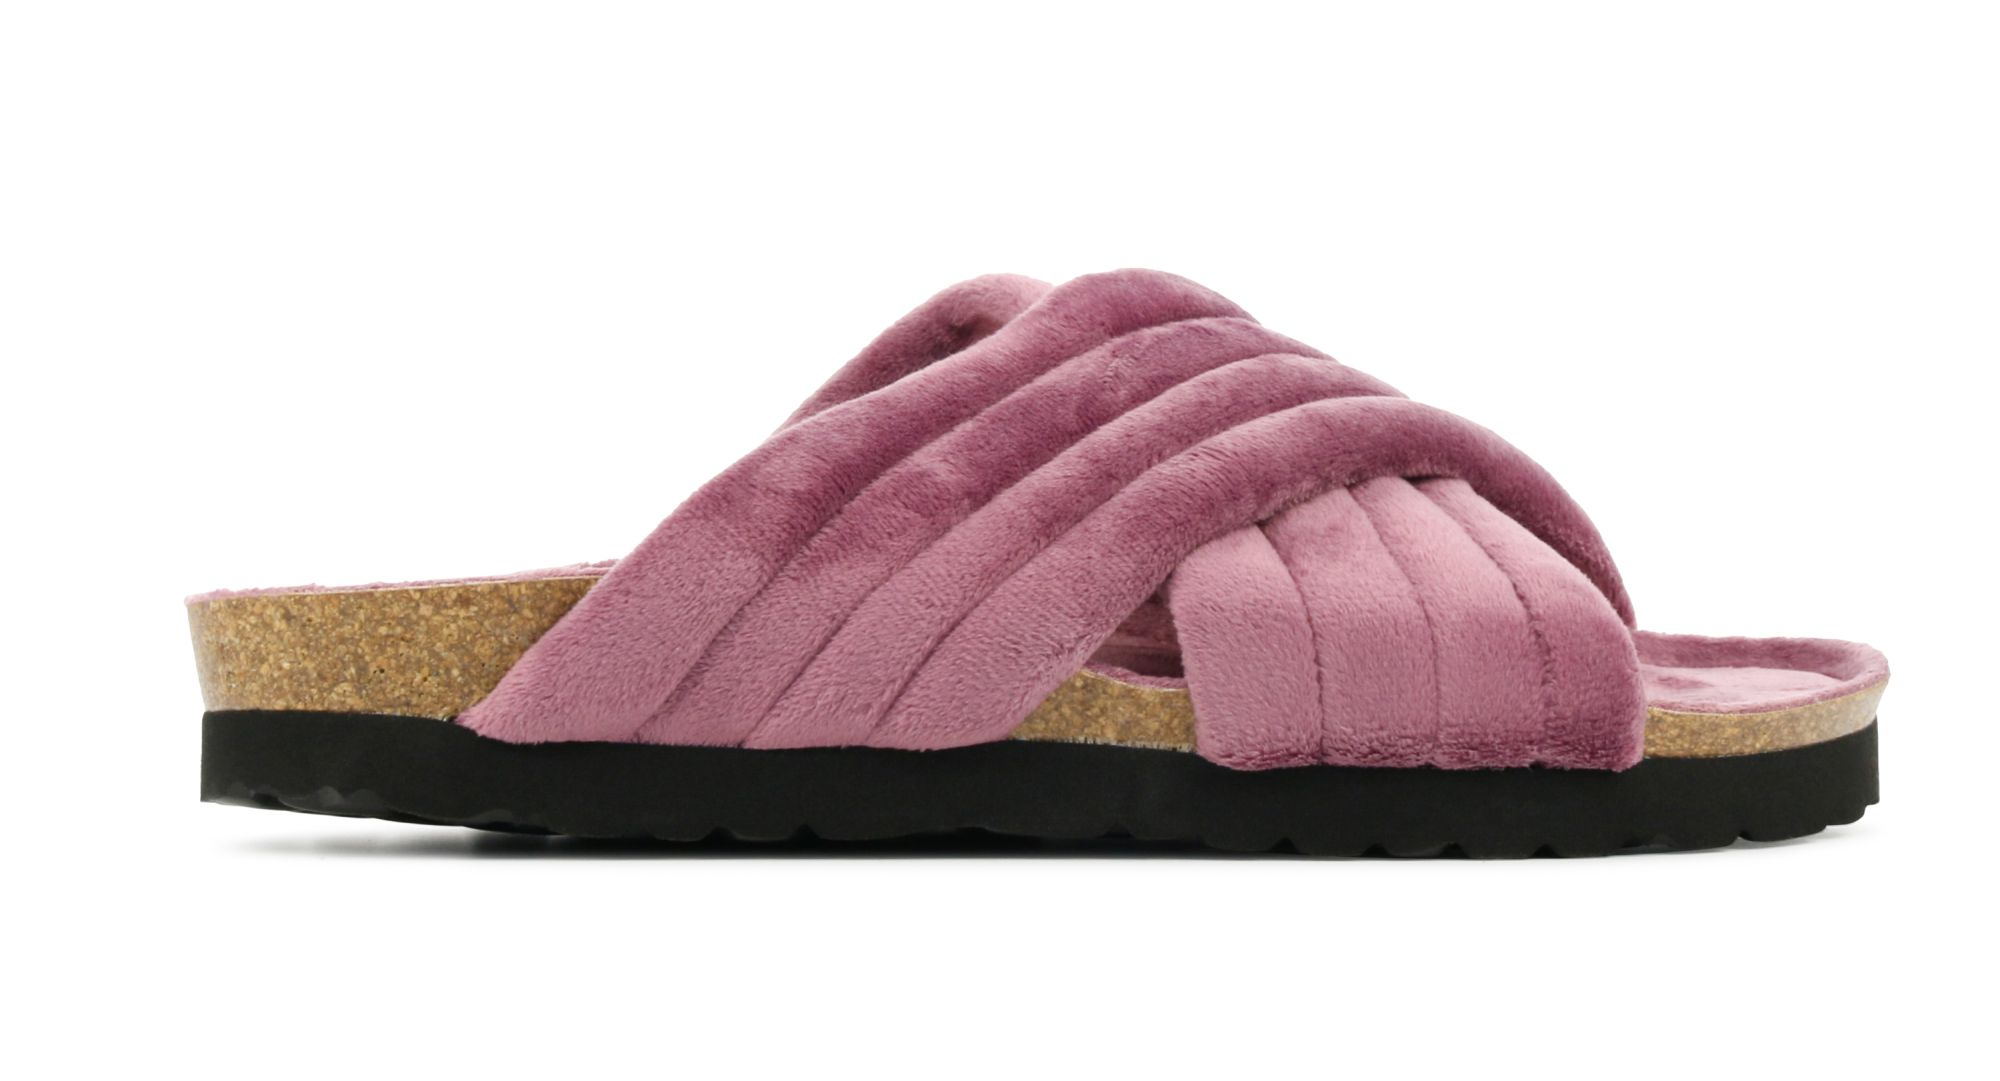 Mace Dames PantoffelsPantoffels